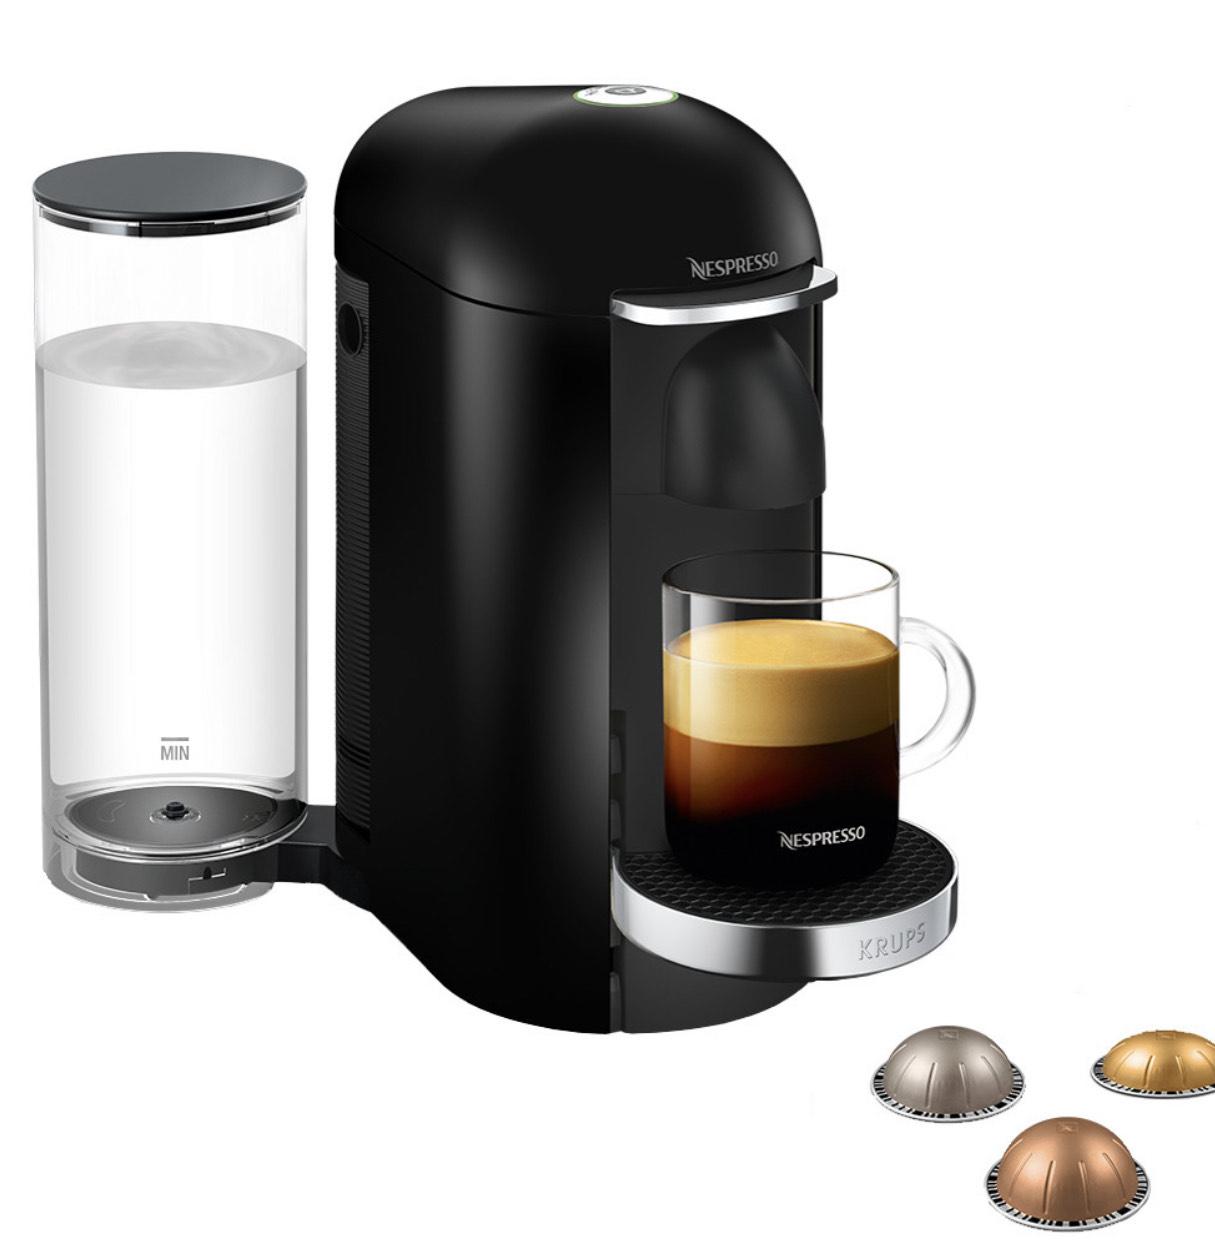 Nespresso Vertuo Plus Deluxe XN9008